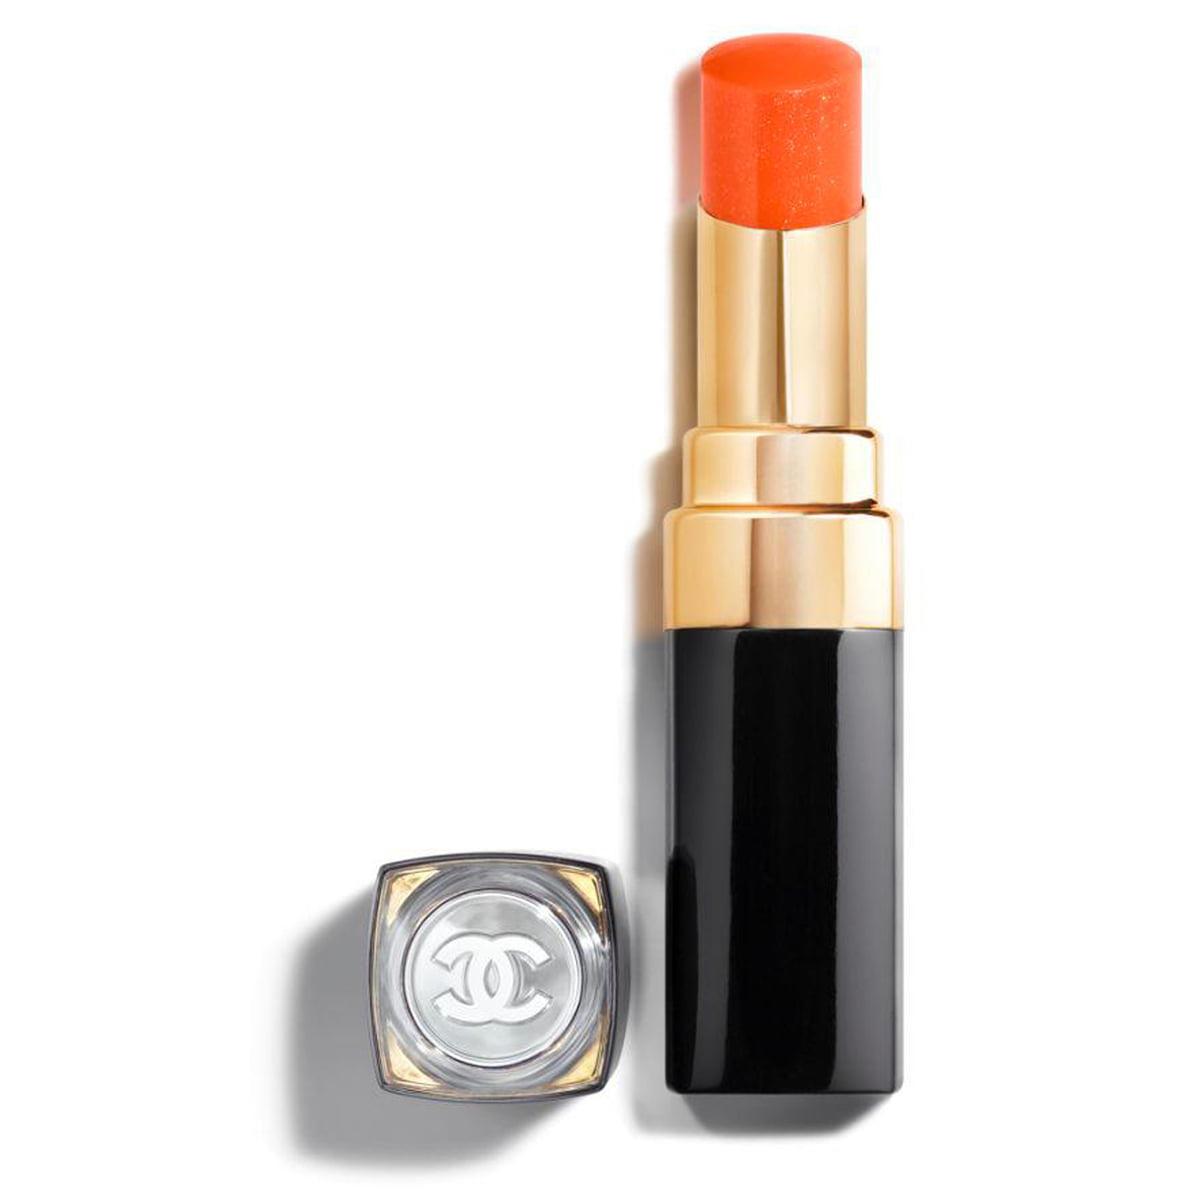 Chanel Rouge Coco Flash Illuminating Top Coat Warm Up 202